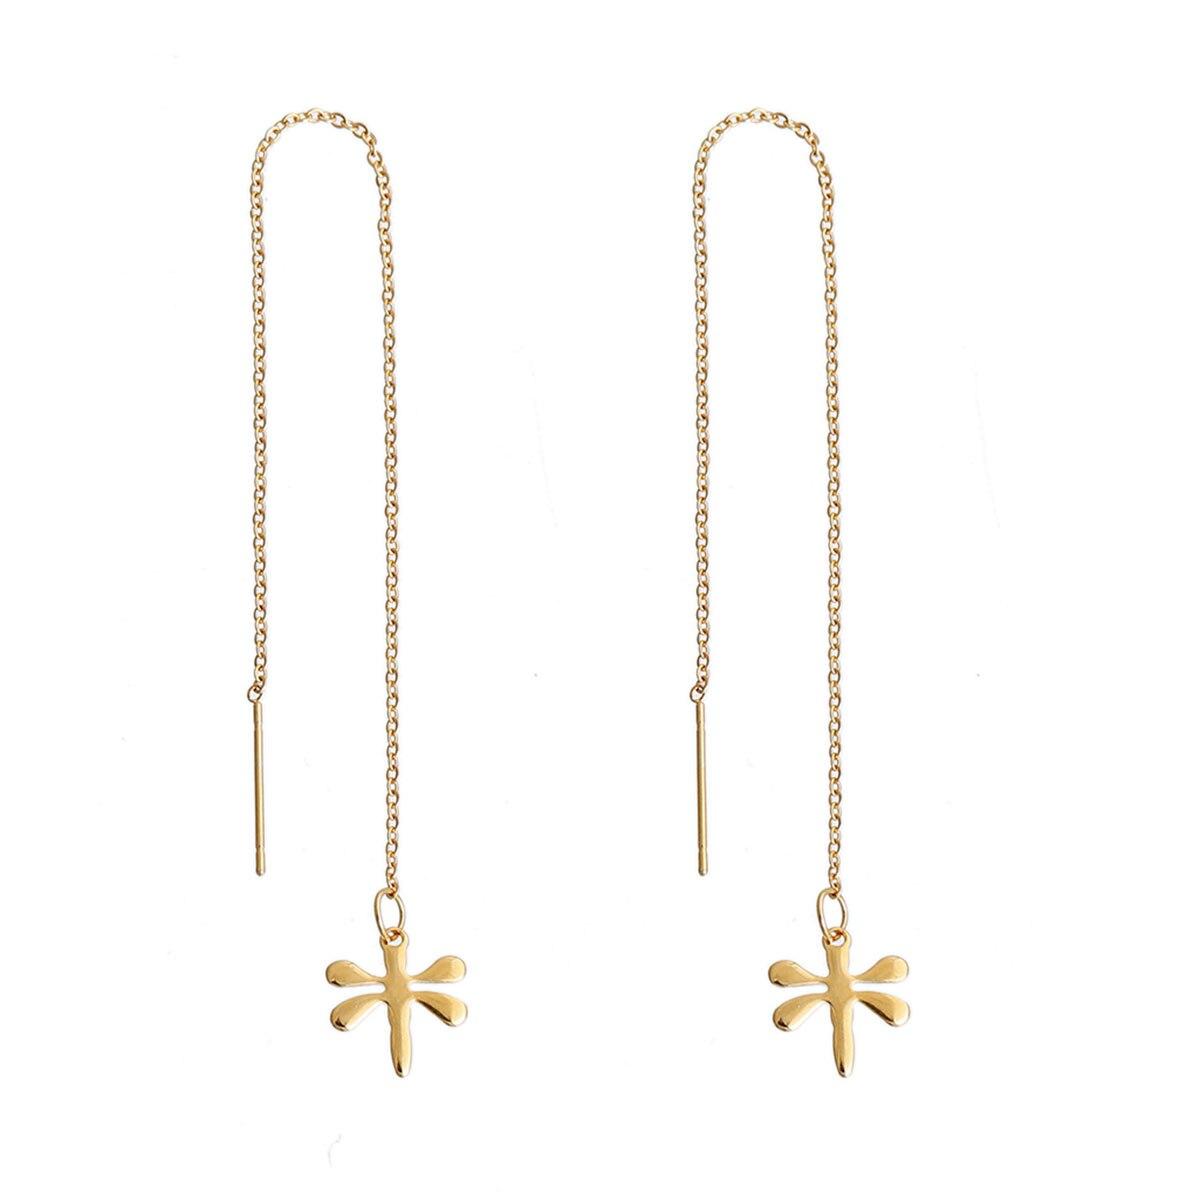 Doreen Box Stainless Steel Ear Thread Threader Earring Gold Color Dragonfly  Animal 142cm(5